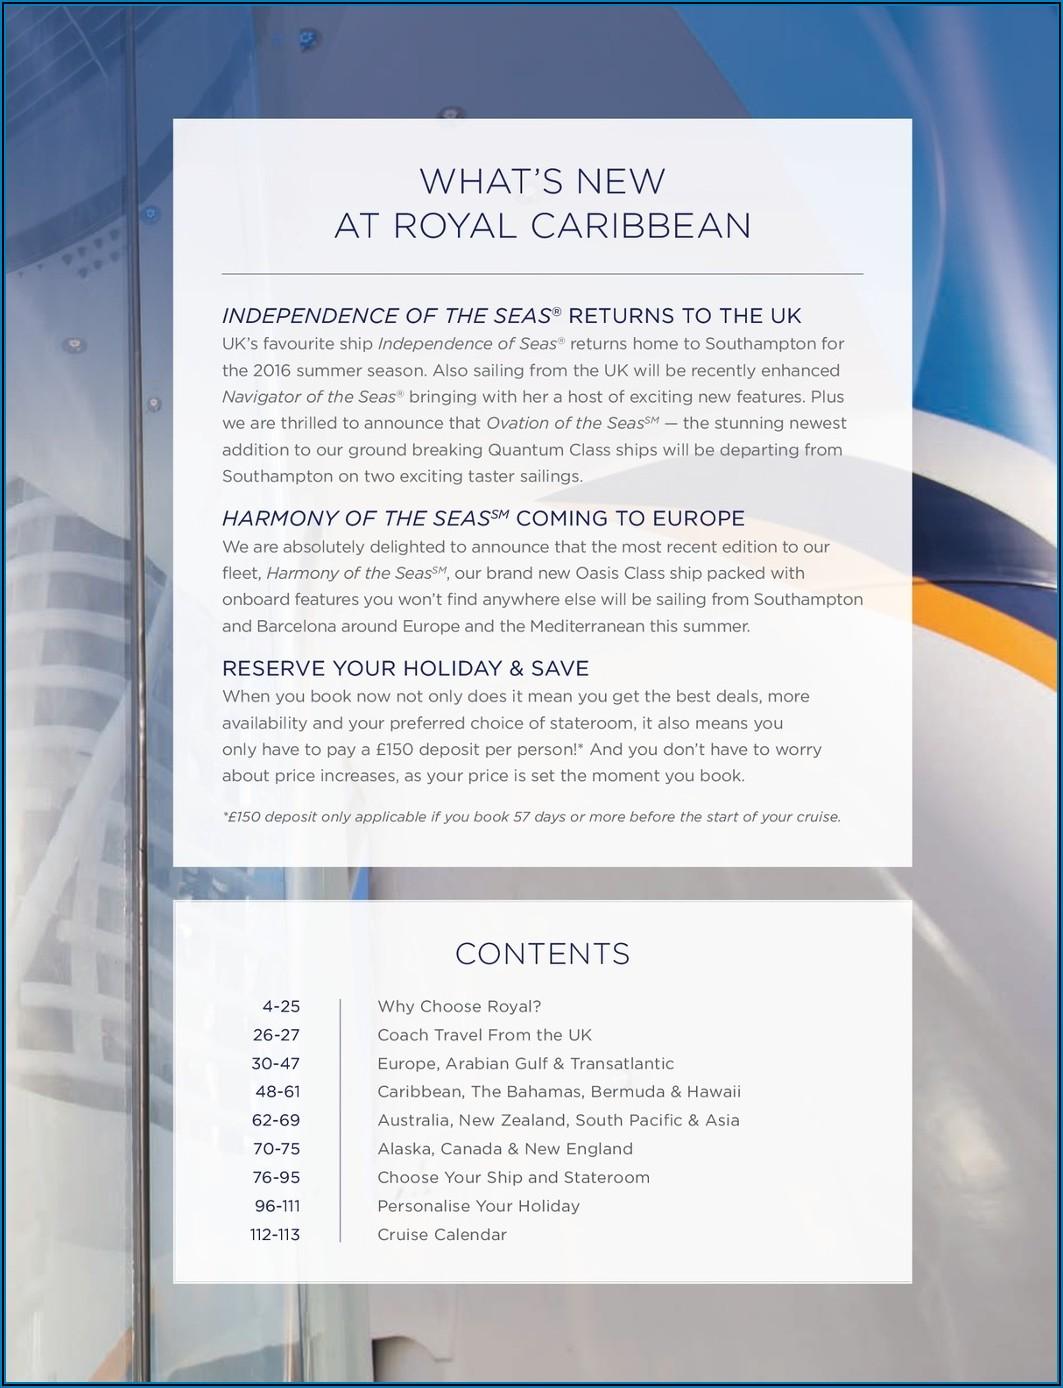 Royal Caribbean Shore Excursions Brochure South Pacific